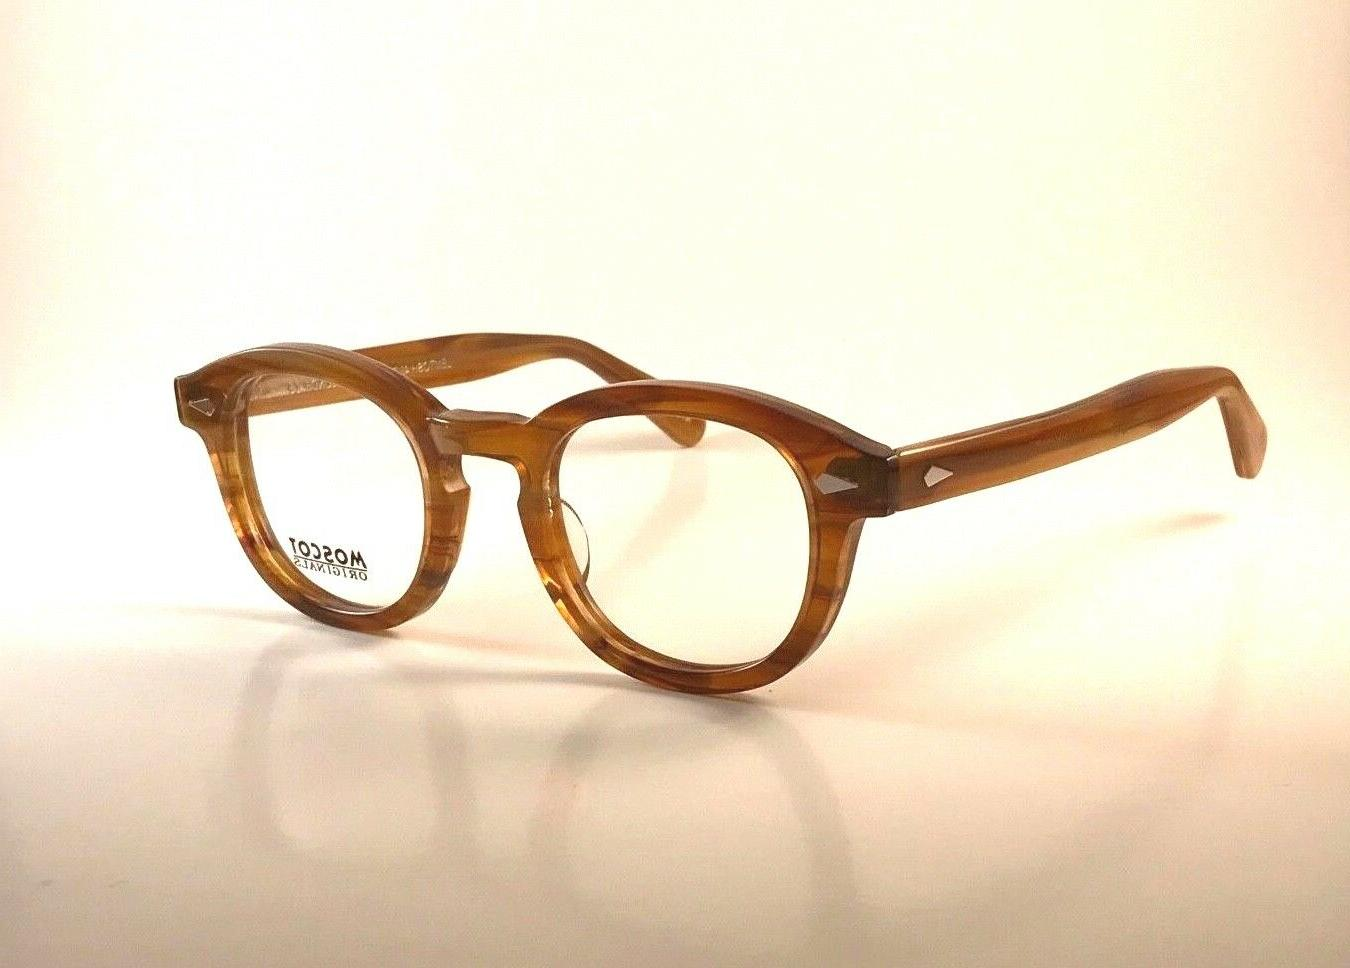 negozio online 008b6 8fadc Moscot Originals Lemtosh Blonde Eyeglasses James Dean Johnny